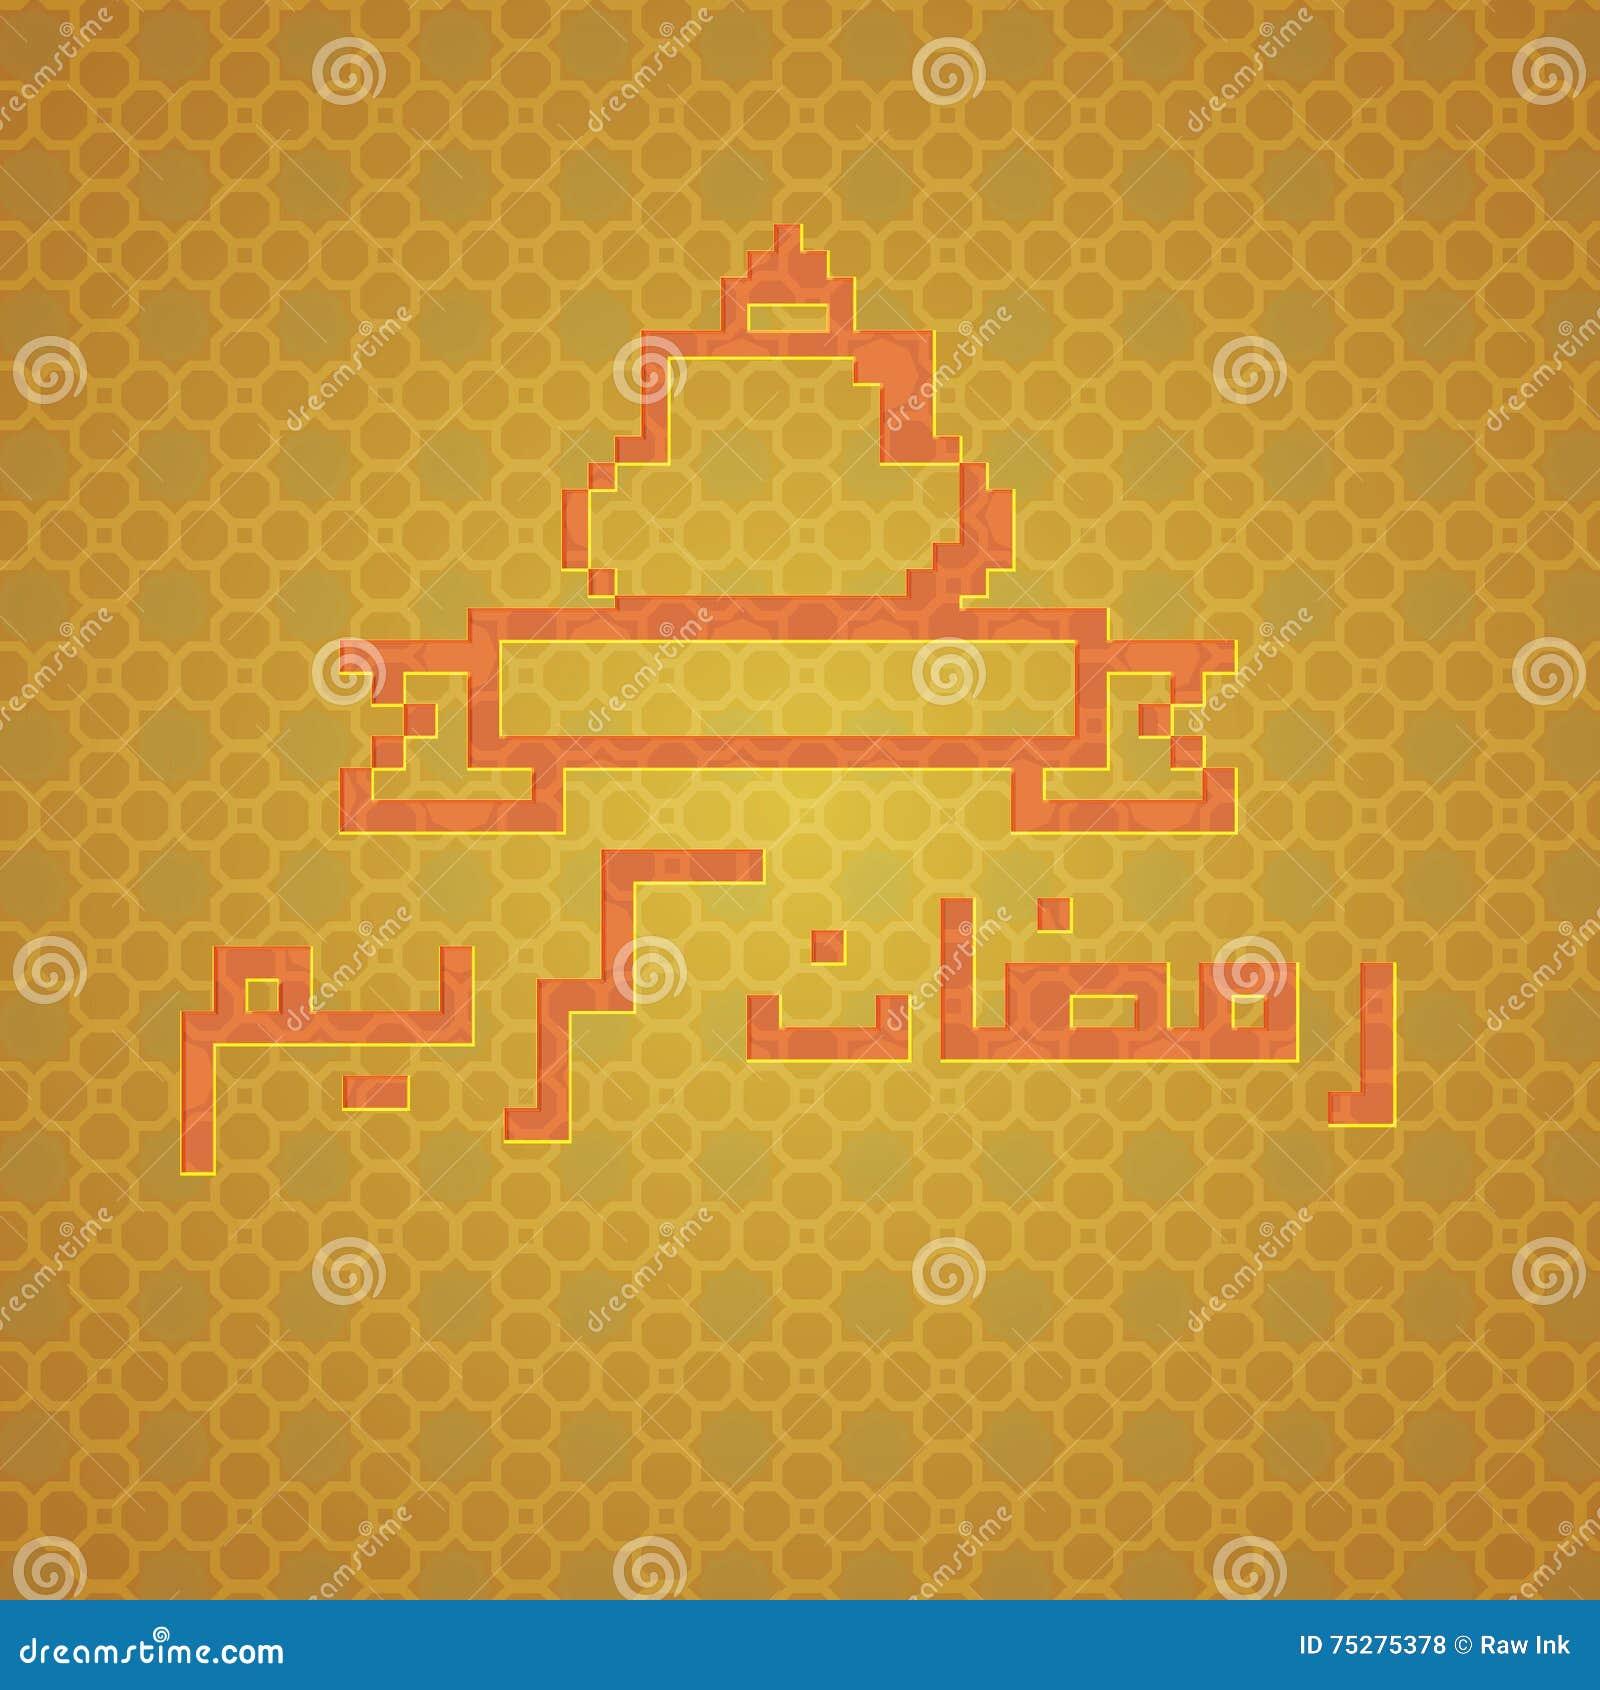 Ramadhan Kareem Grid Pixel Letter